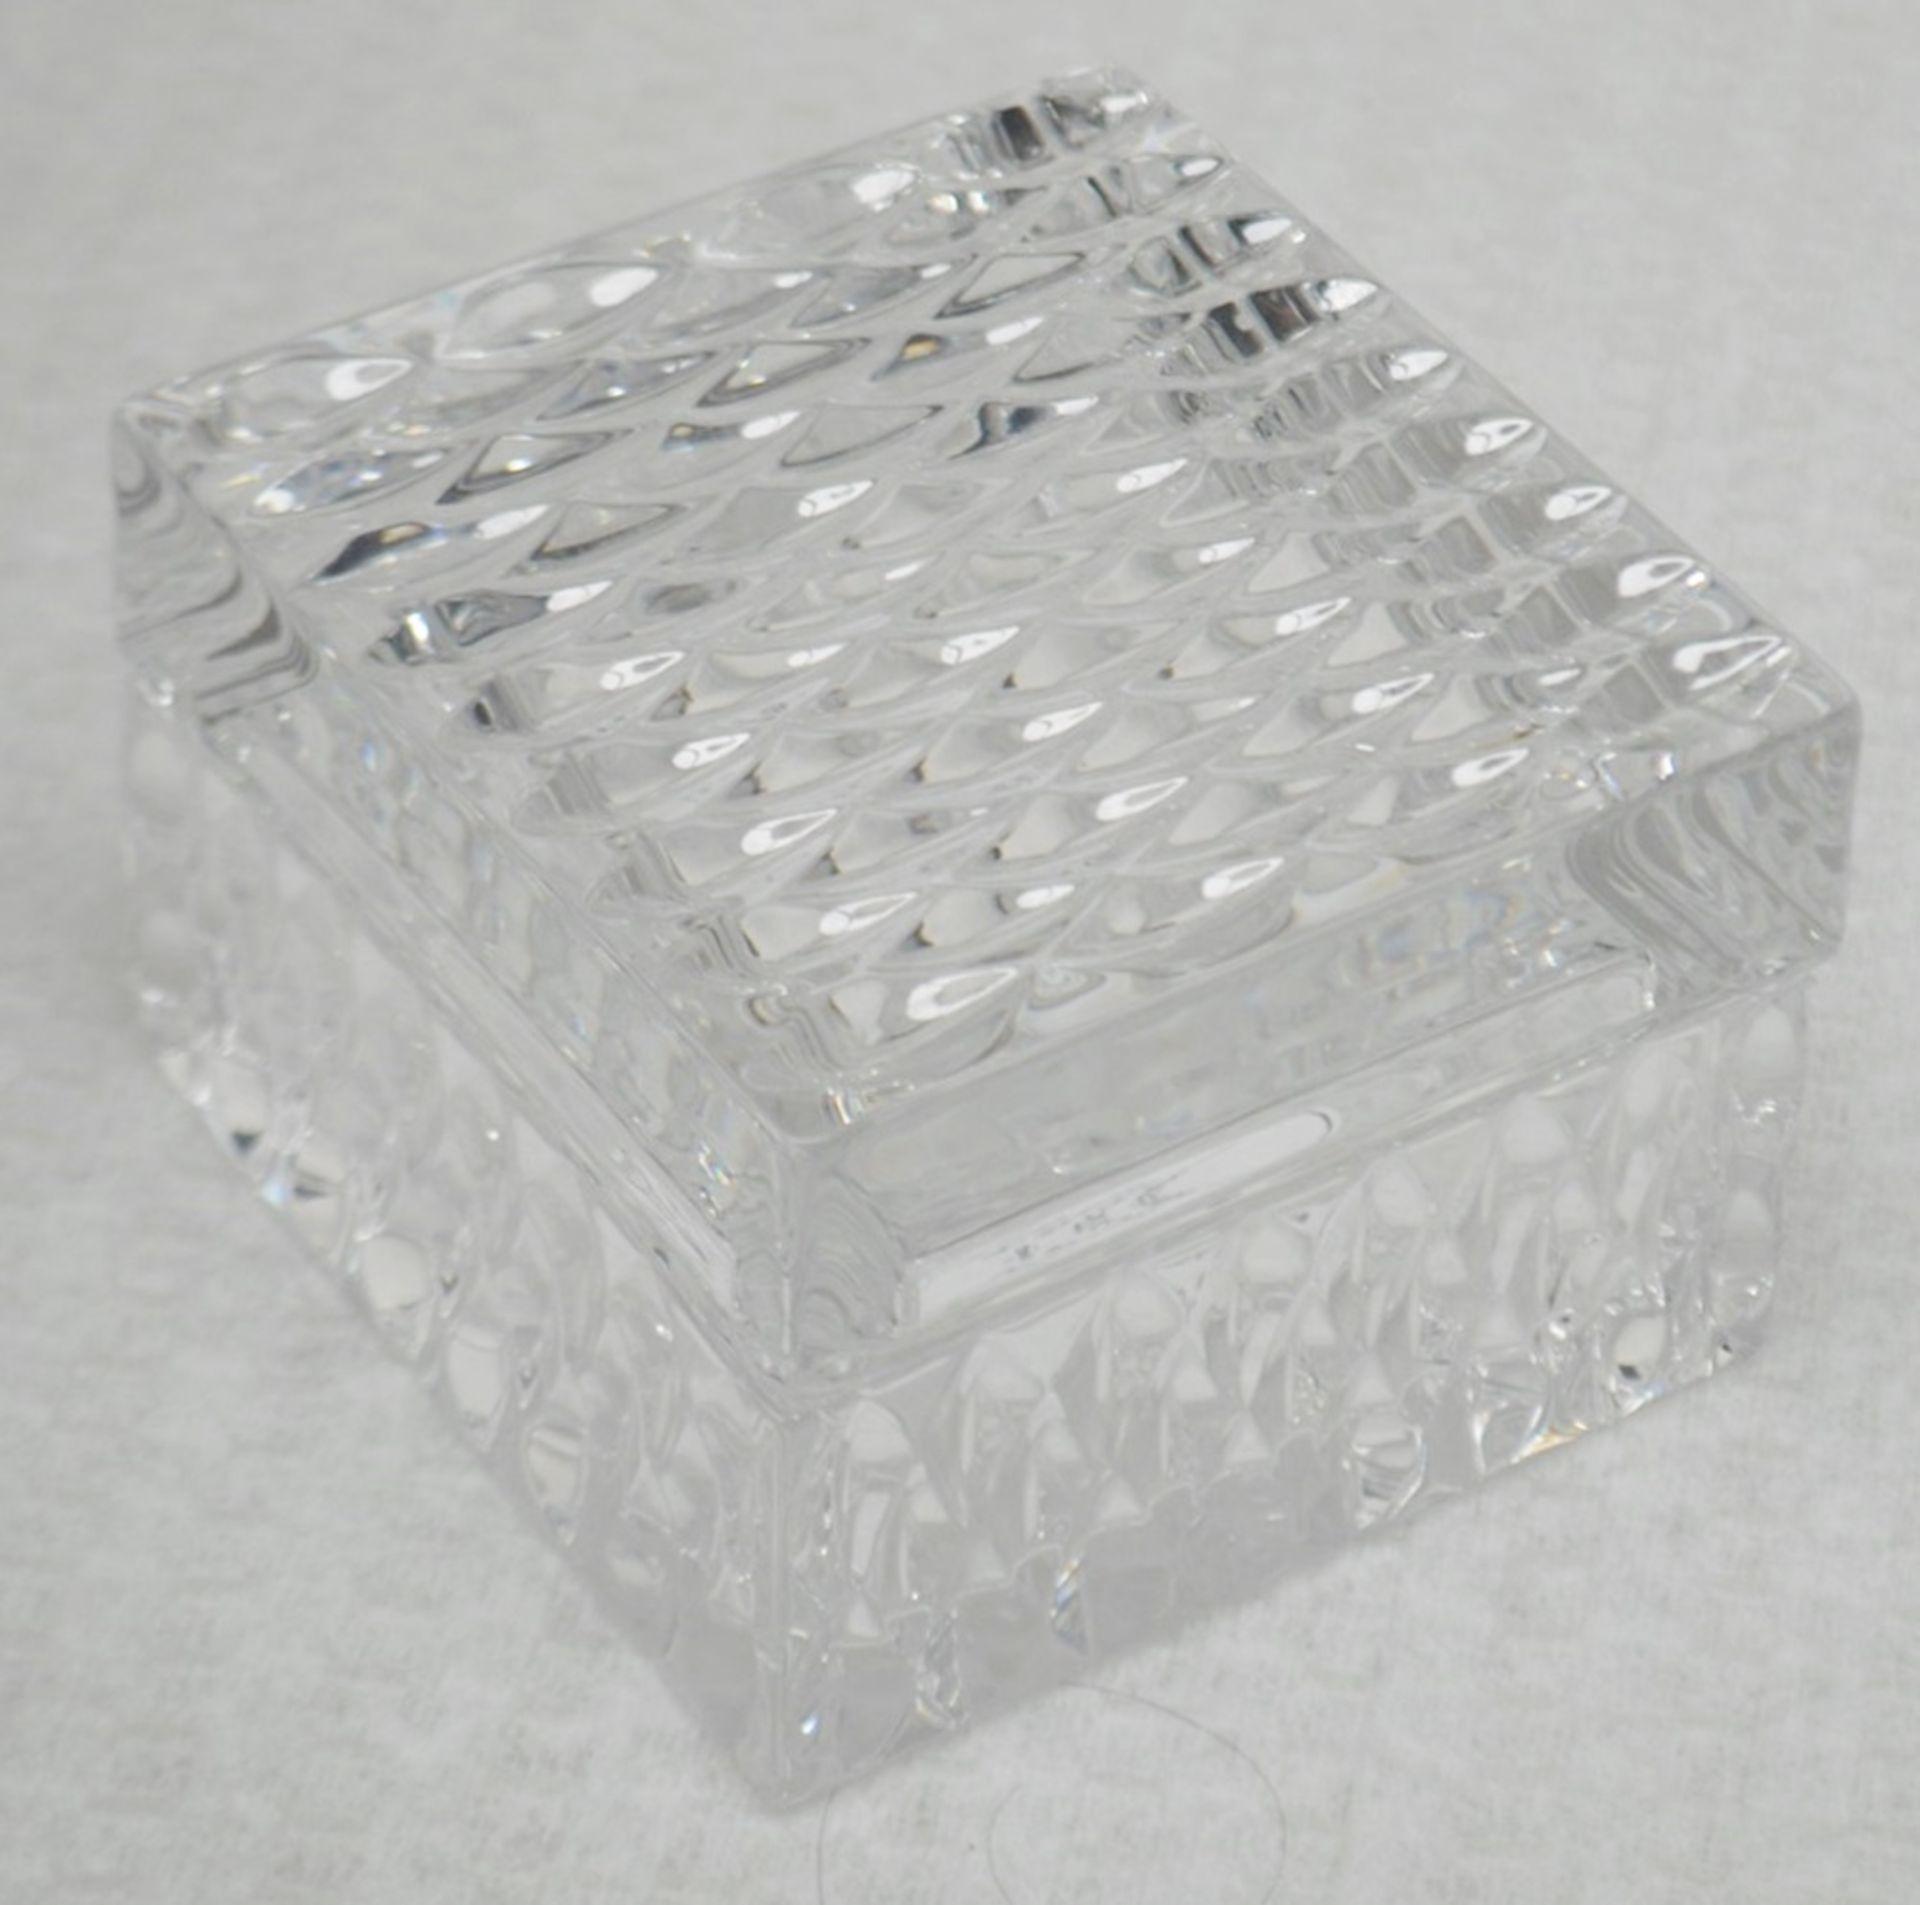 1 x BALDI 'Home Jewels' Italian Hand-crafted Artisan Clear Diamond Crystal Perfume Box, With A